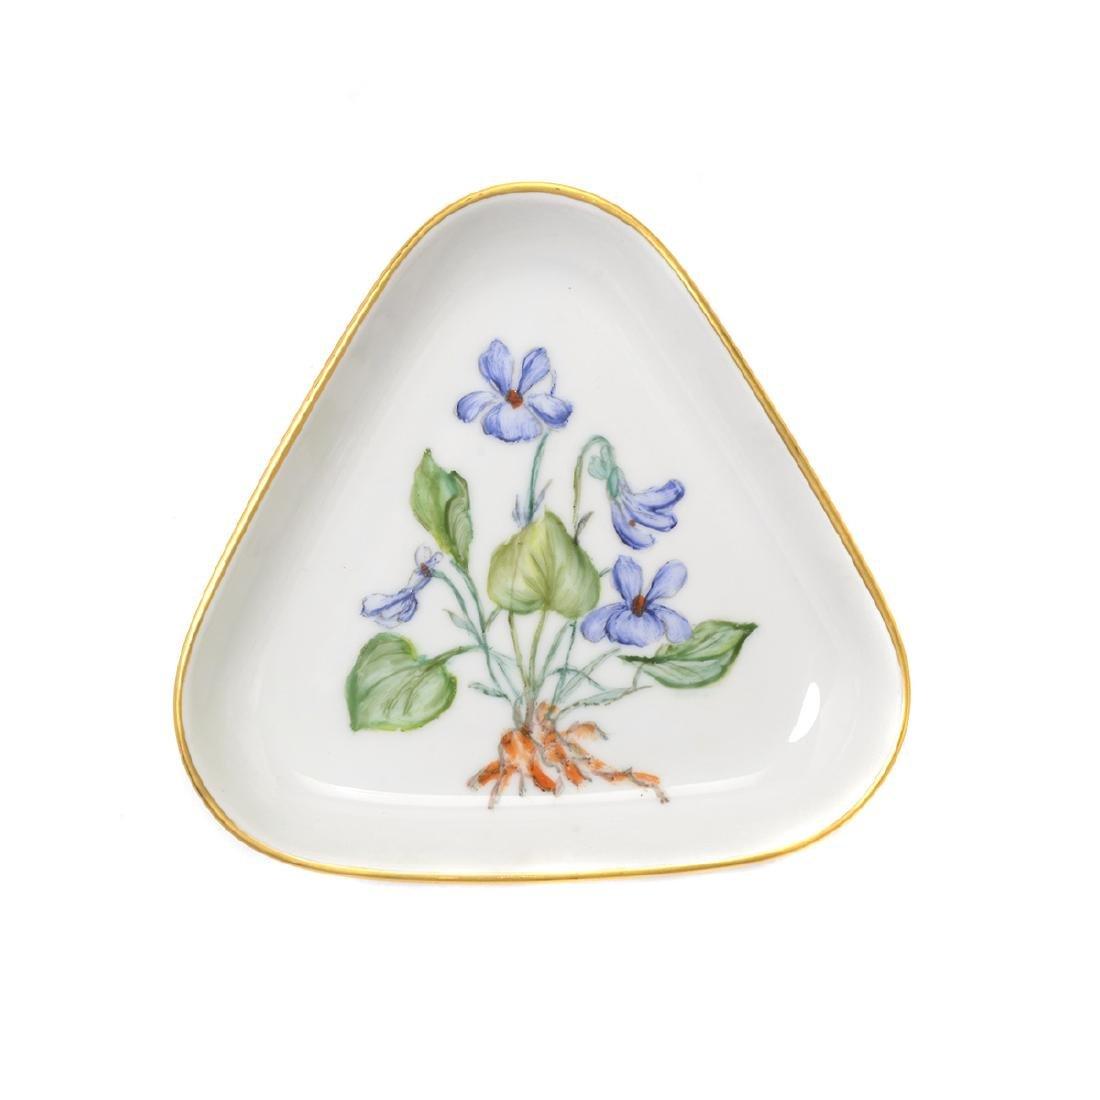 Royal Copenhagen Porcelain Serving and Table Articles - 8